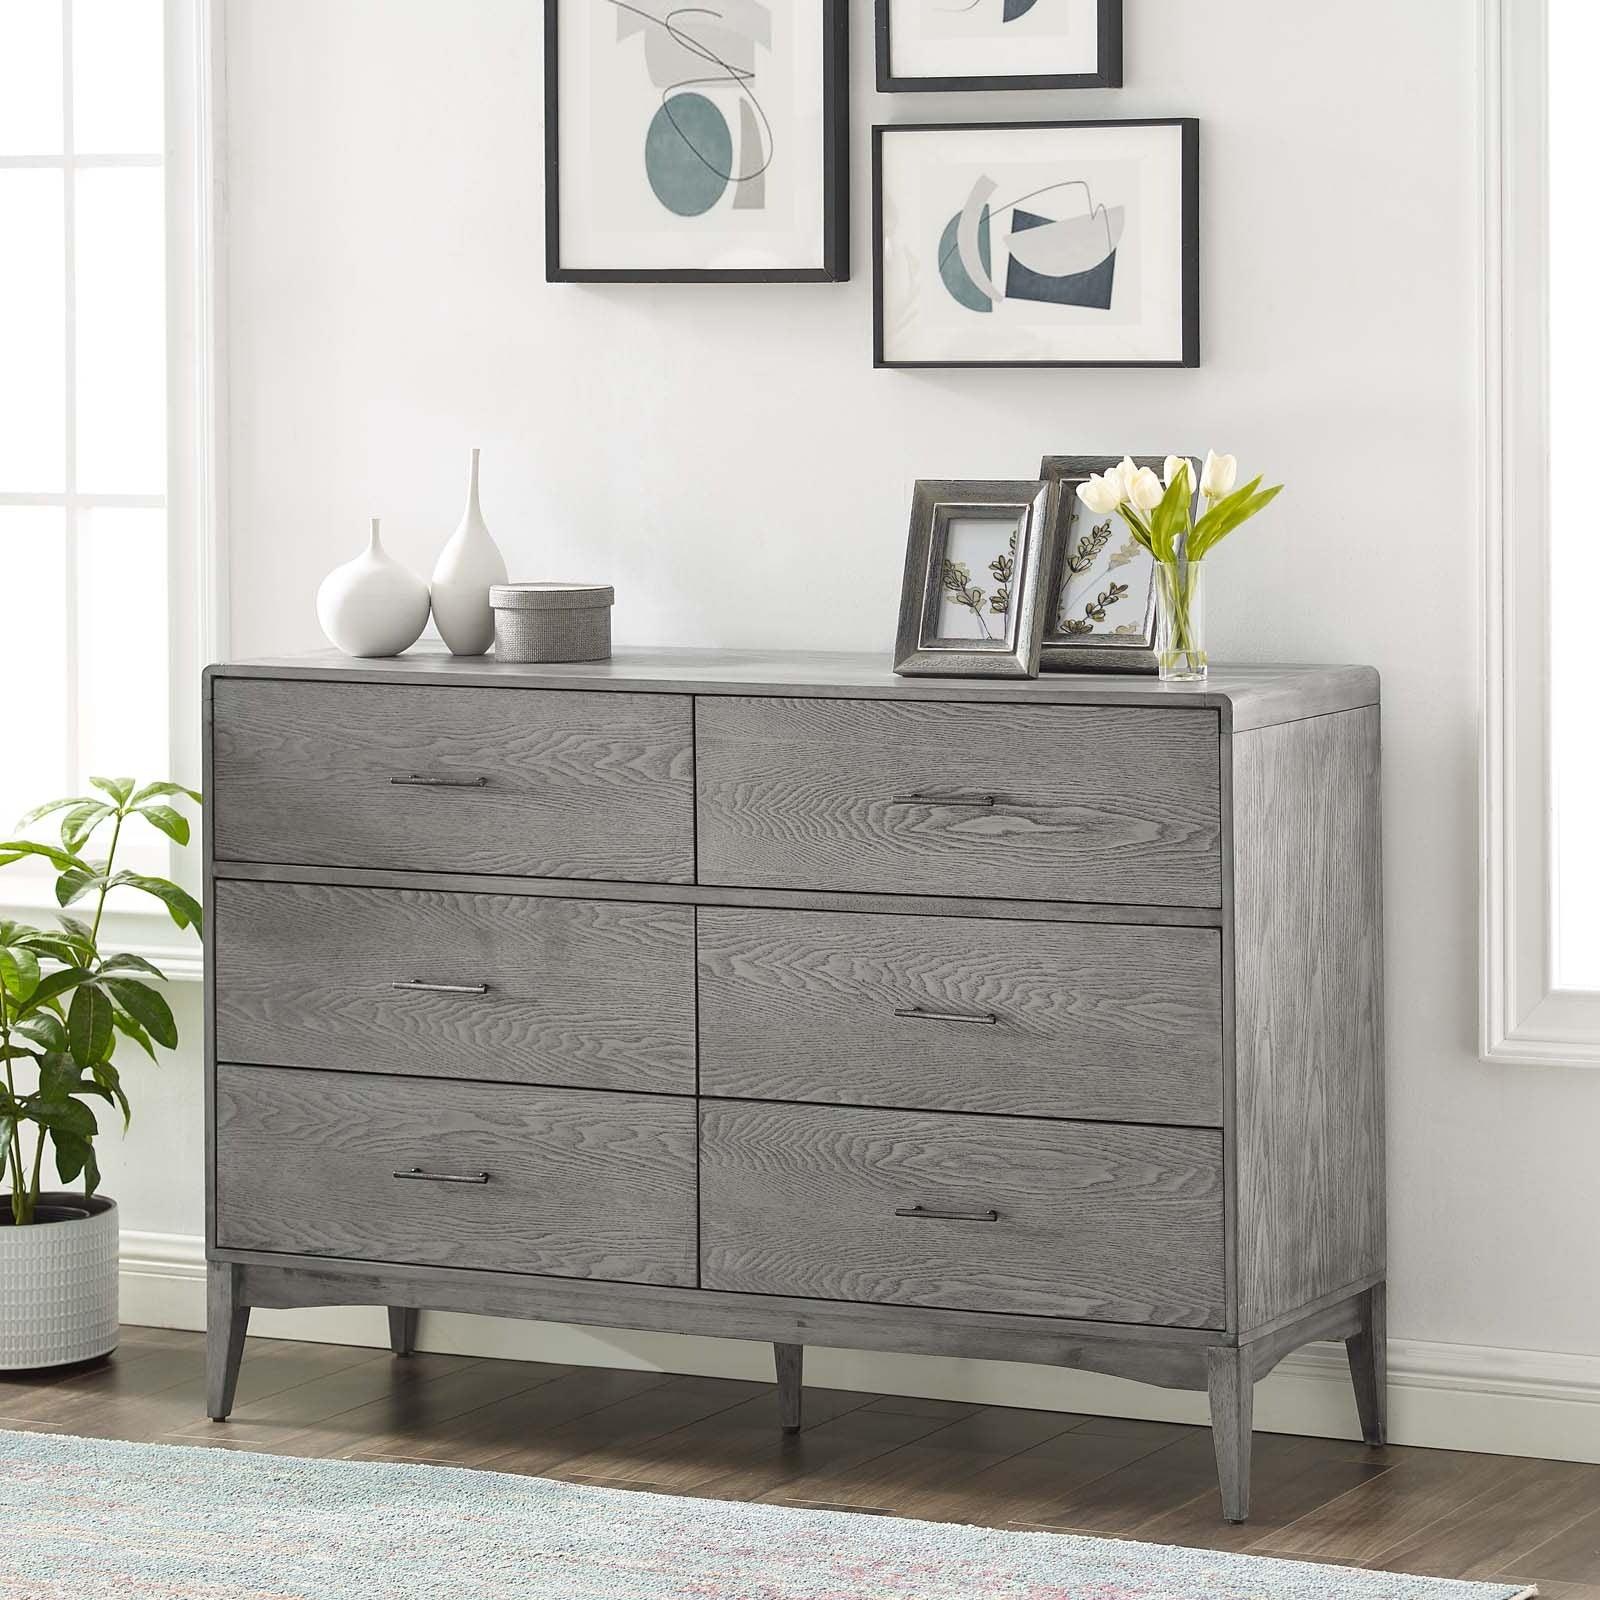 georgia wood dresser gray